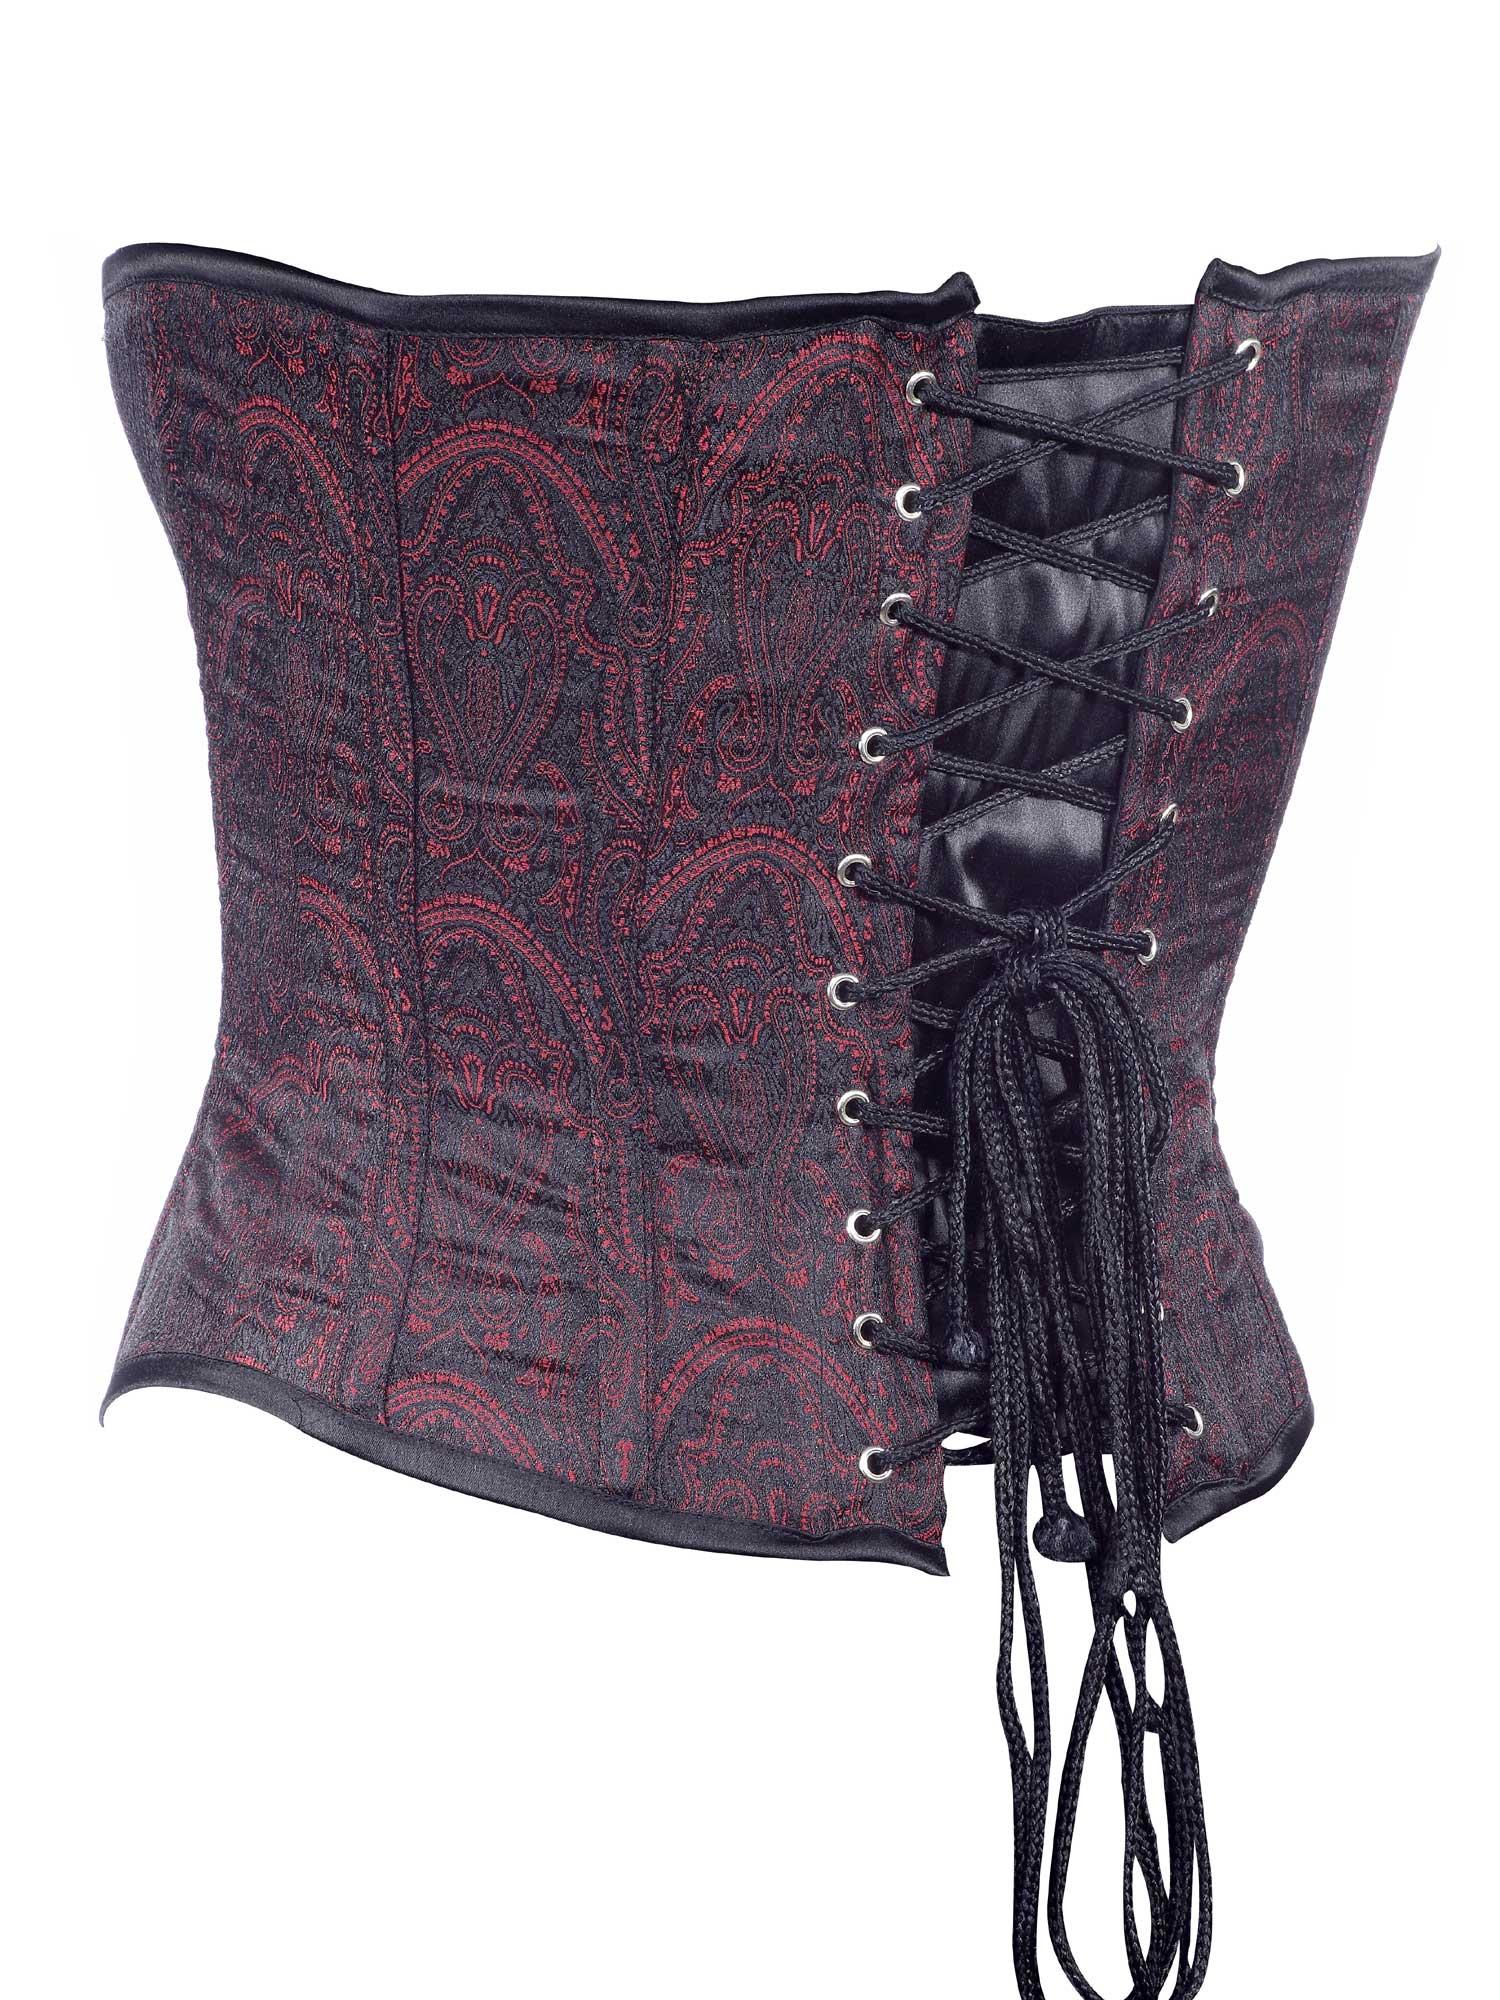 brown_jacquard_fabric_steel_boning_underbust_corset_waist_cincher_bustier_bustiers_and_corsets_3.jpg